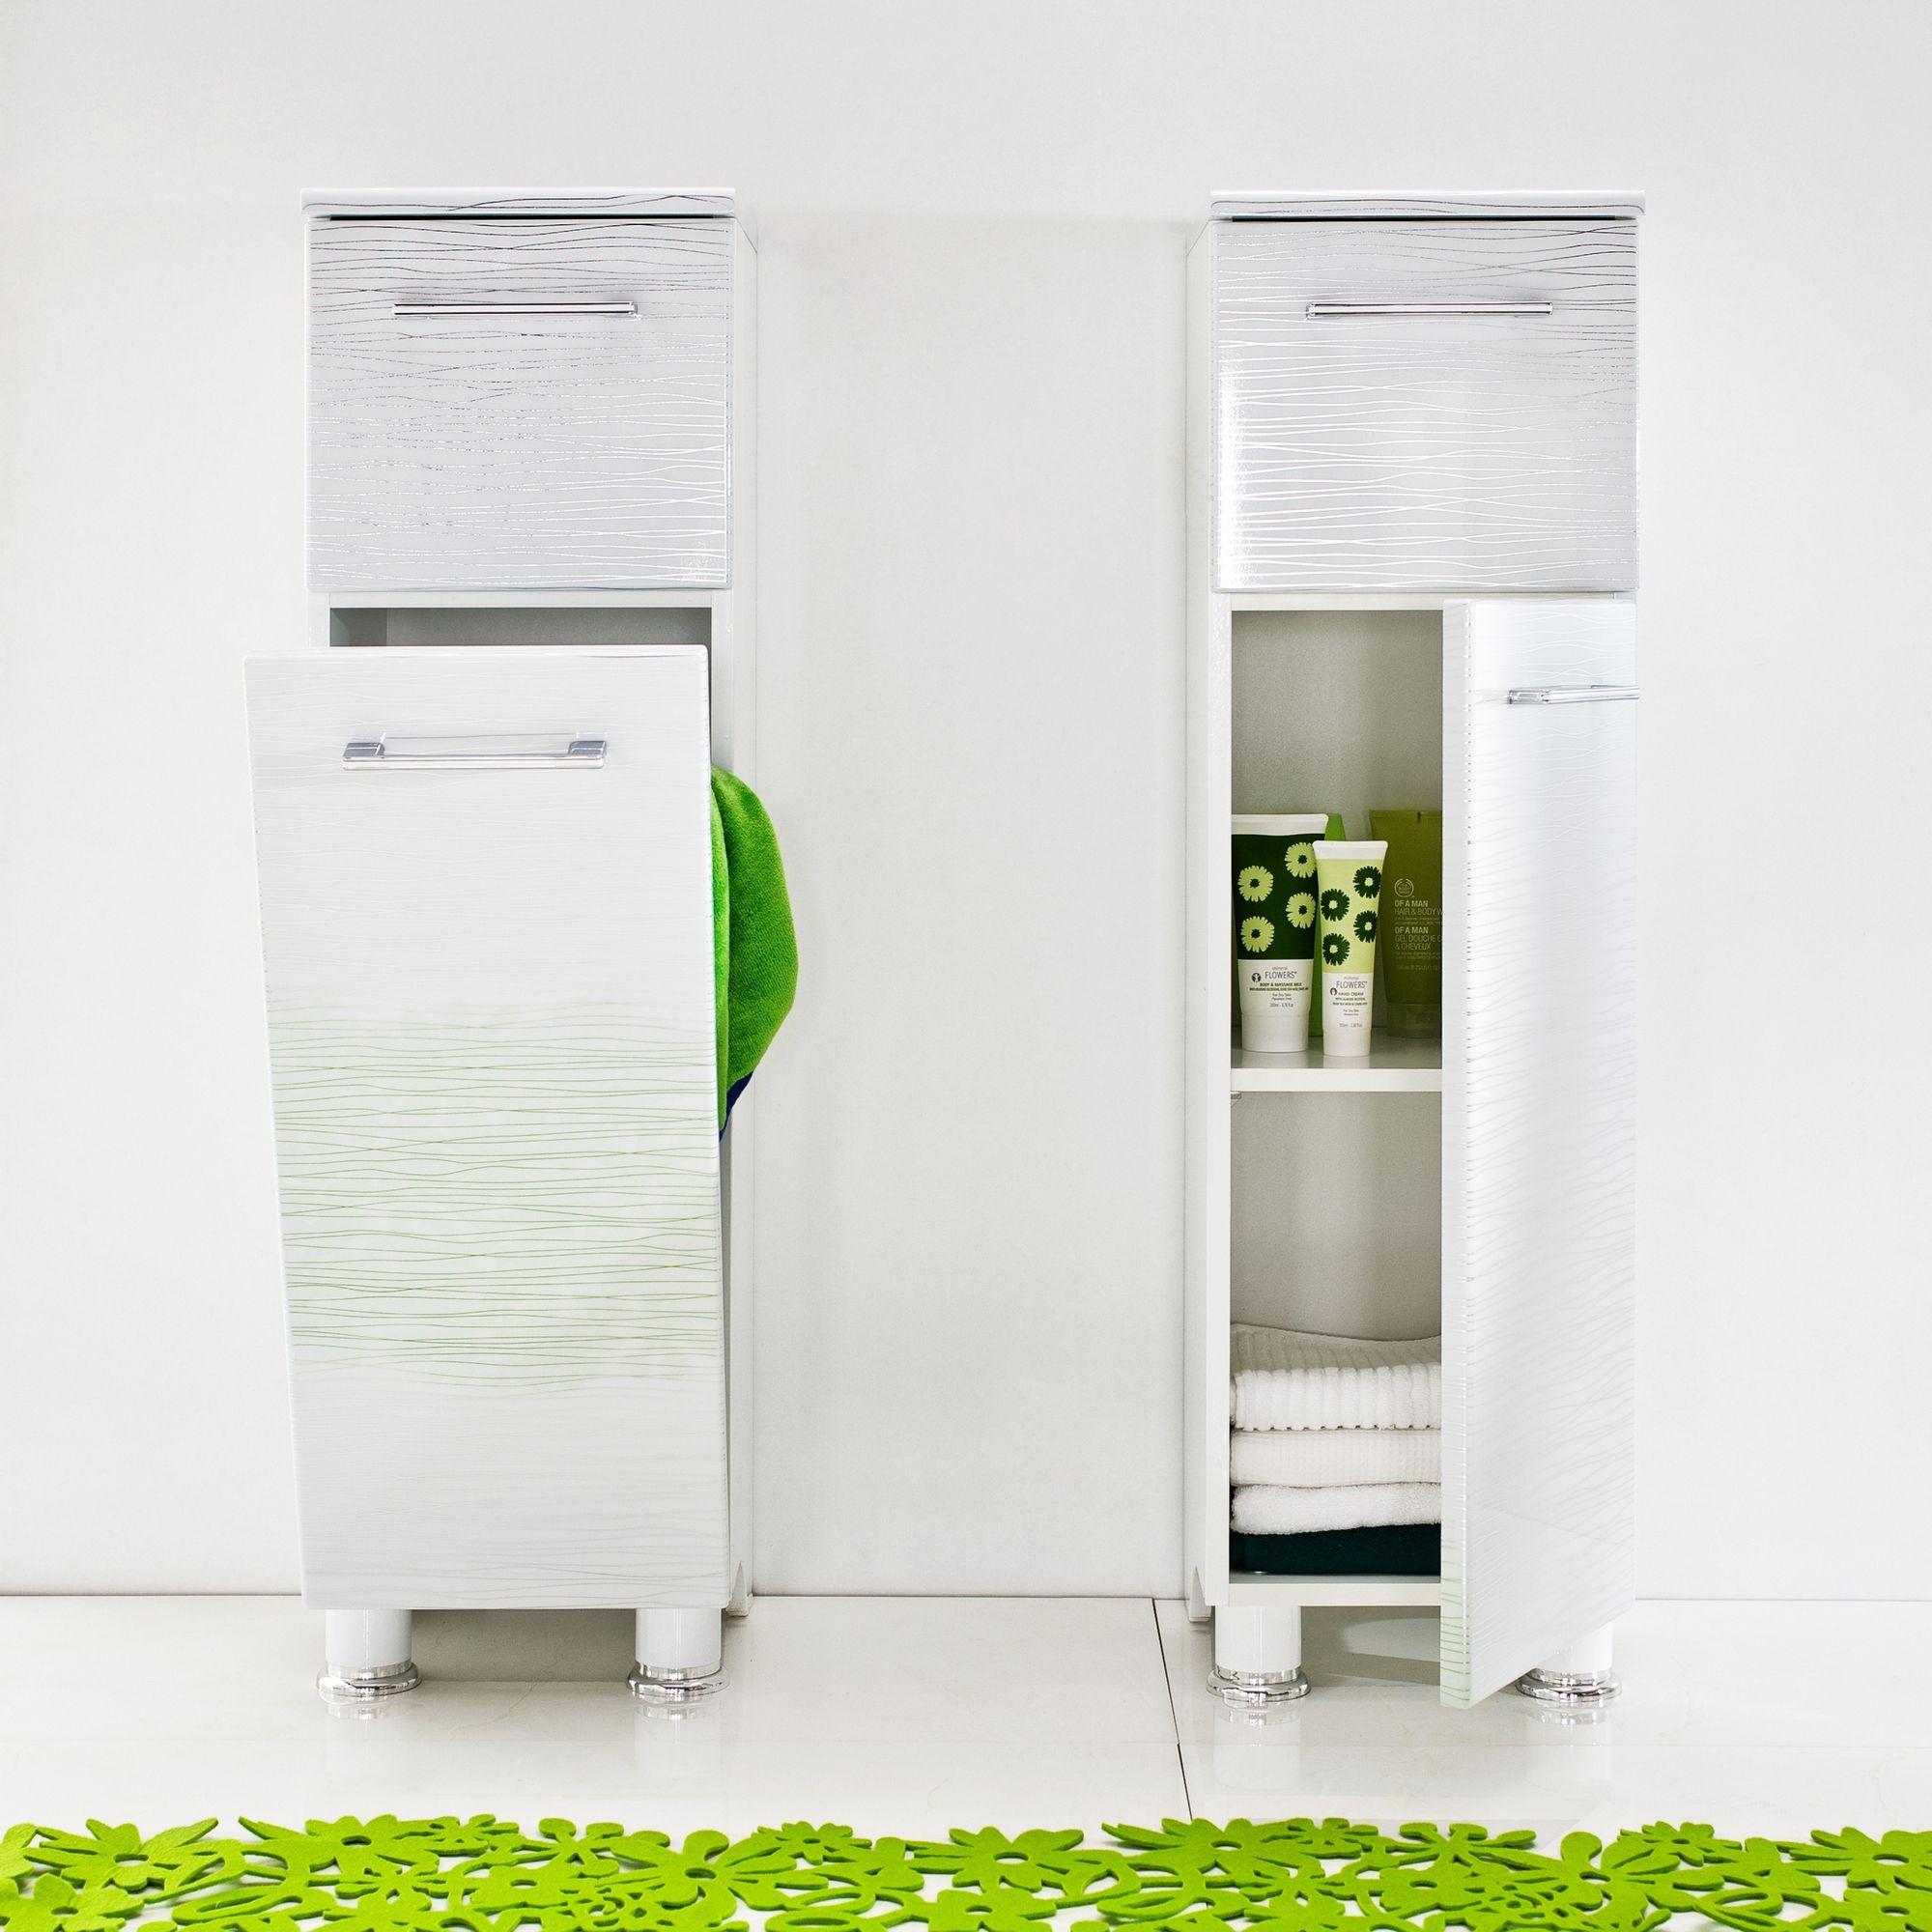 Bathroom Floor Cabinet With Hamper Bathroom Design 2017 2018 Pinterest Bathroom Floor Cabinets